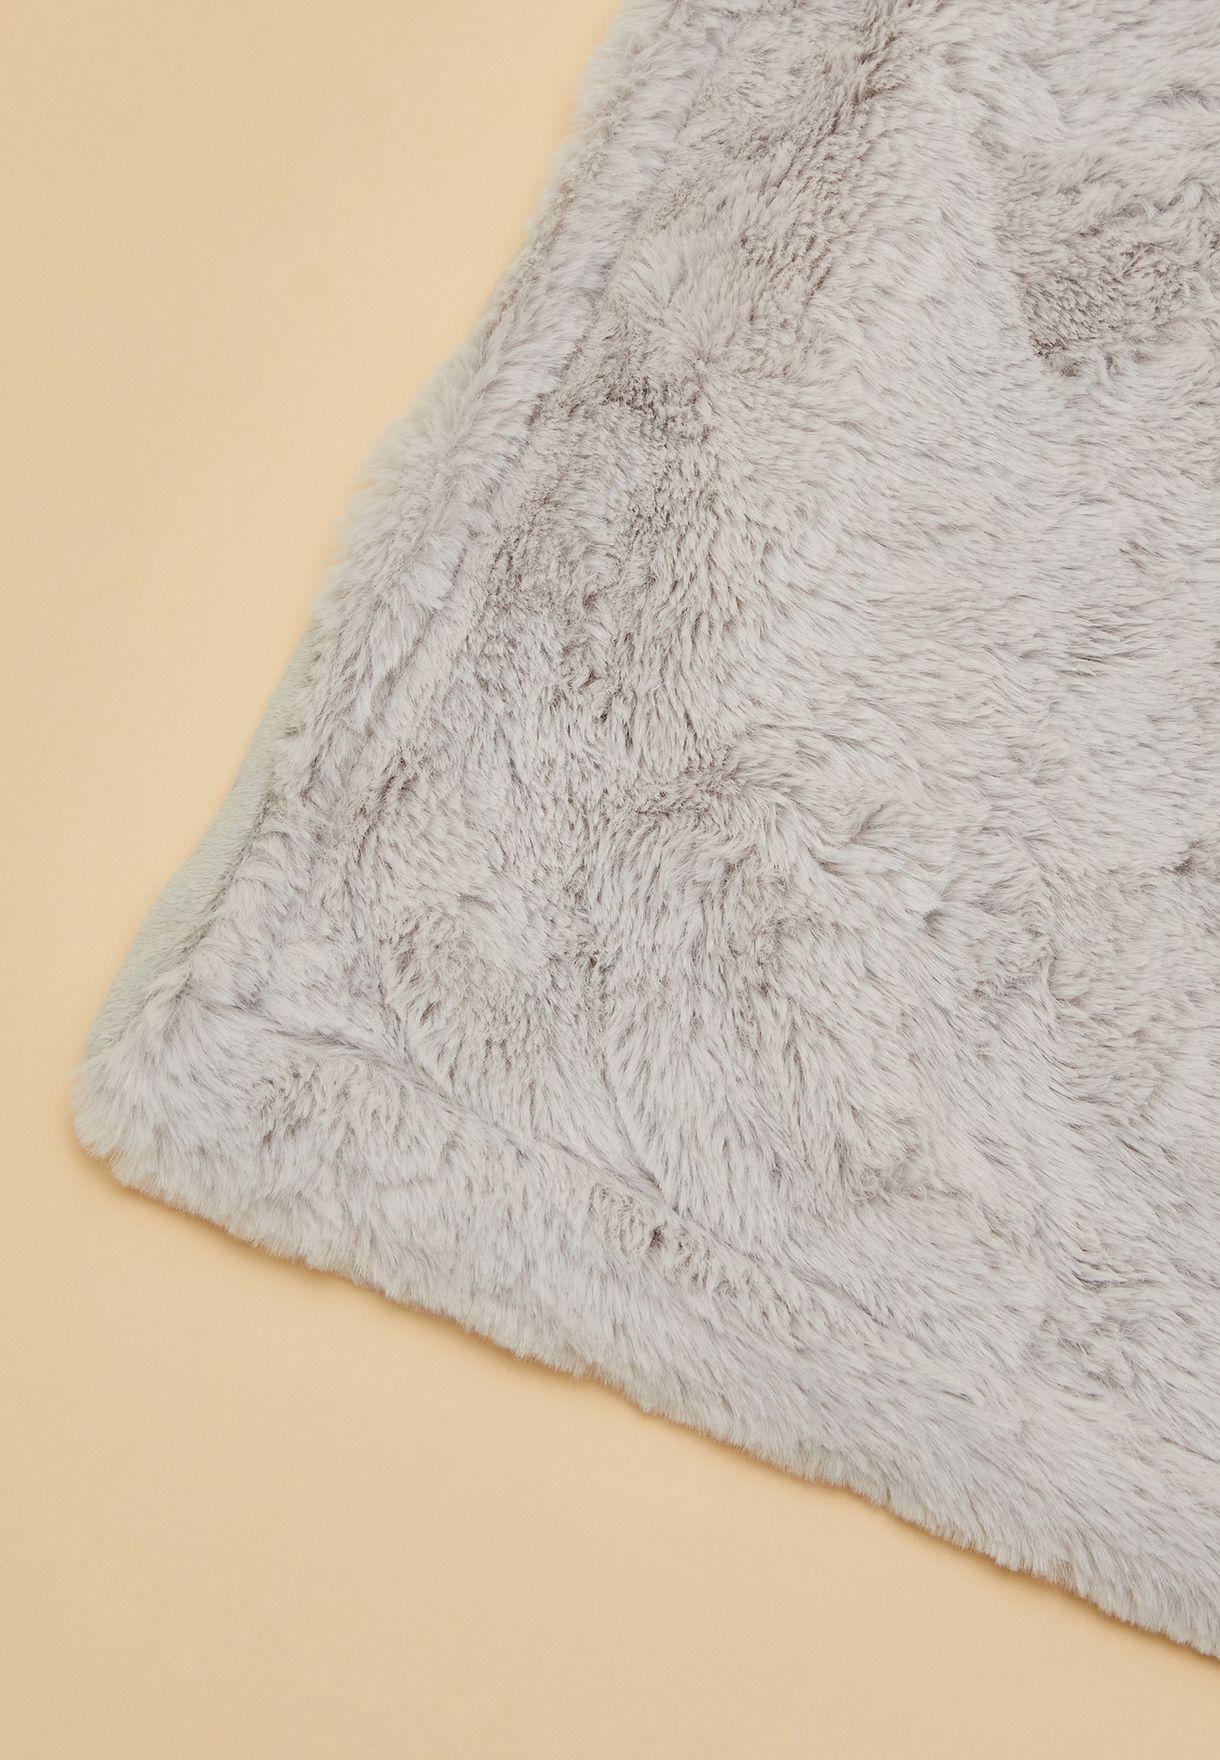 Stella Lovey Blanket Free Download | 1760x1220